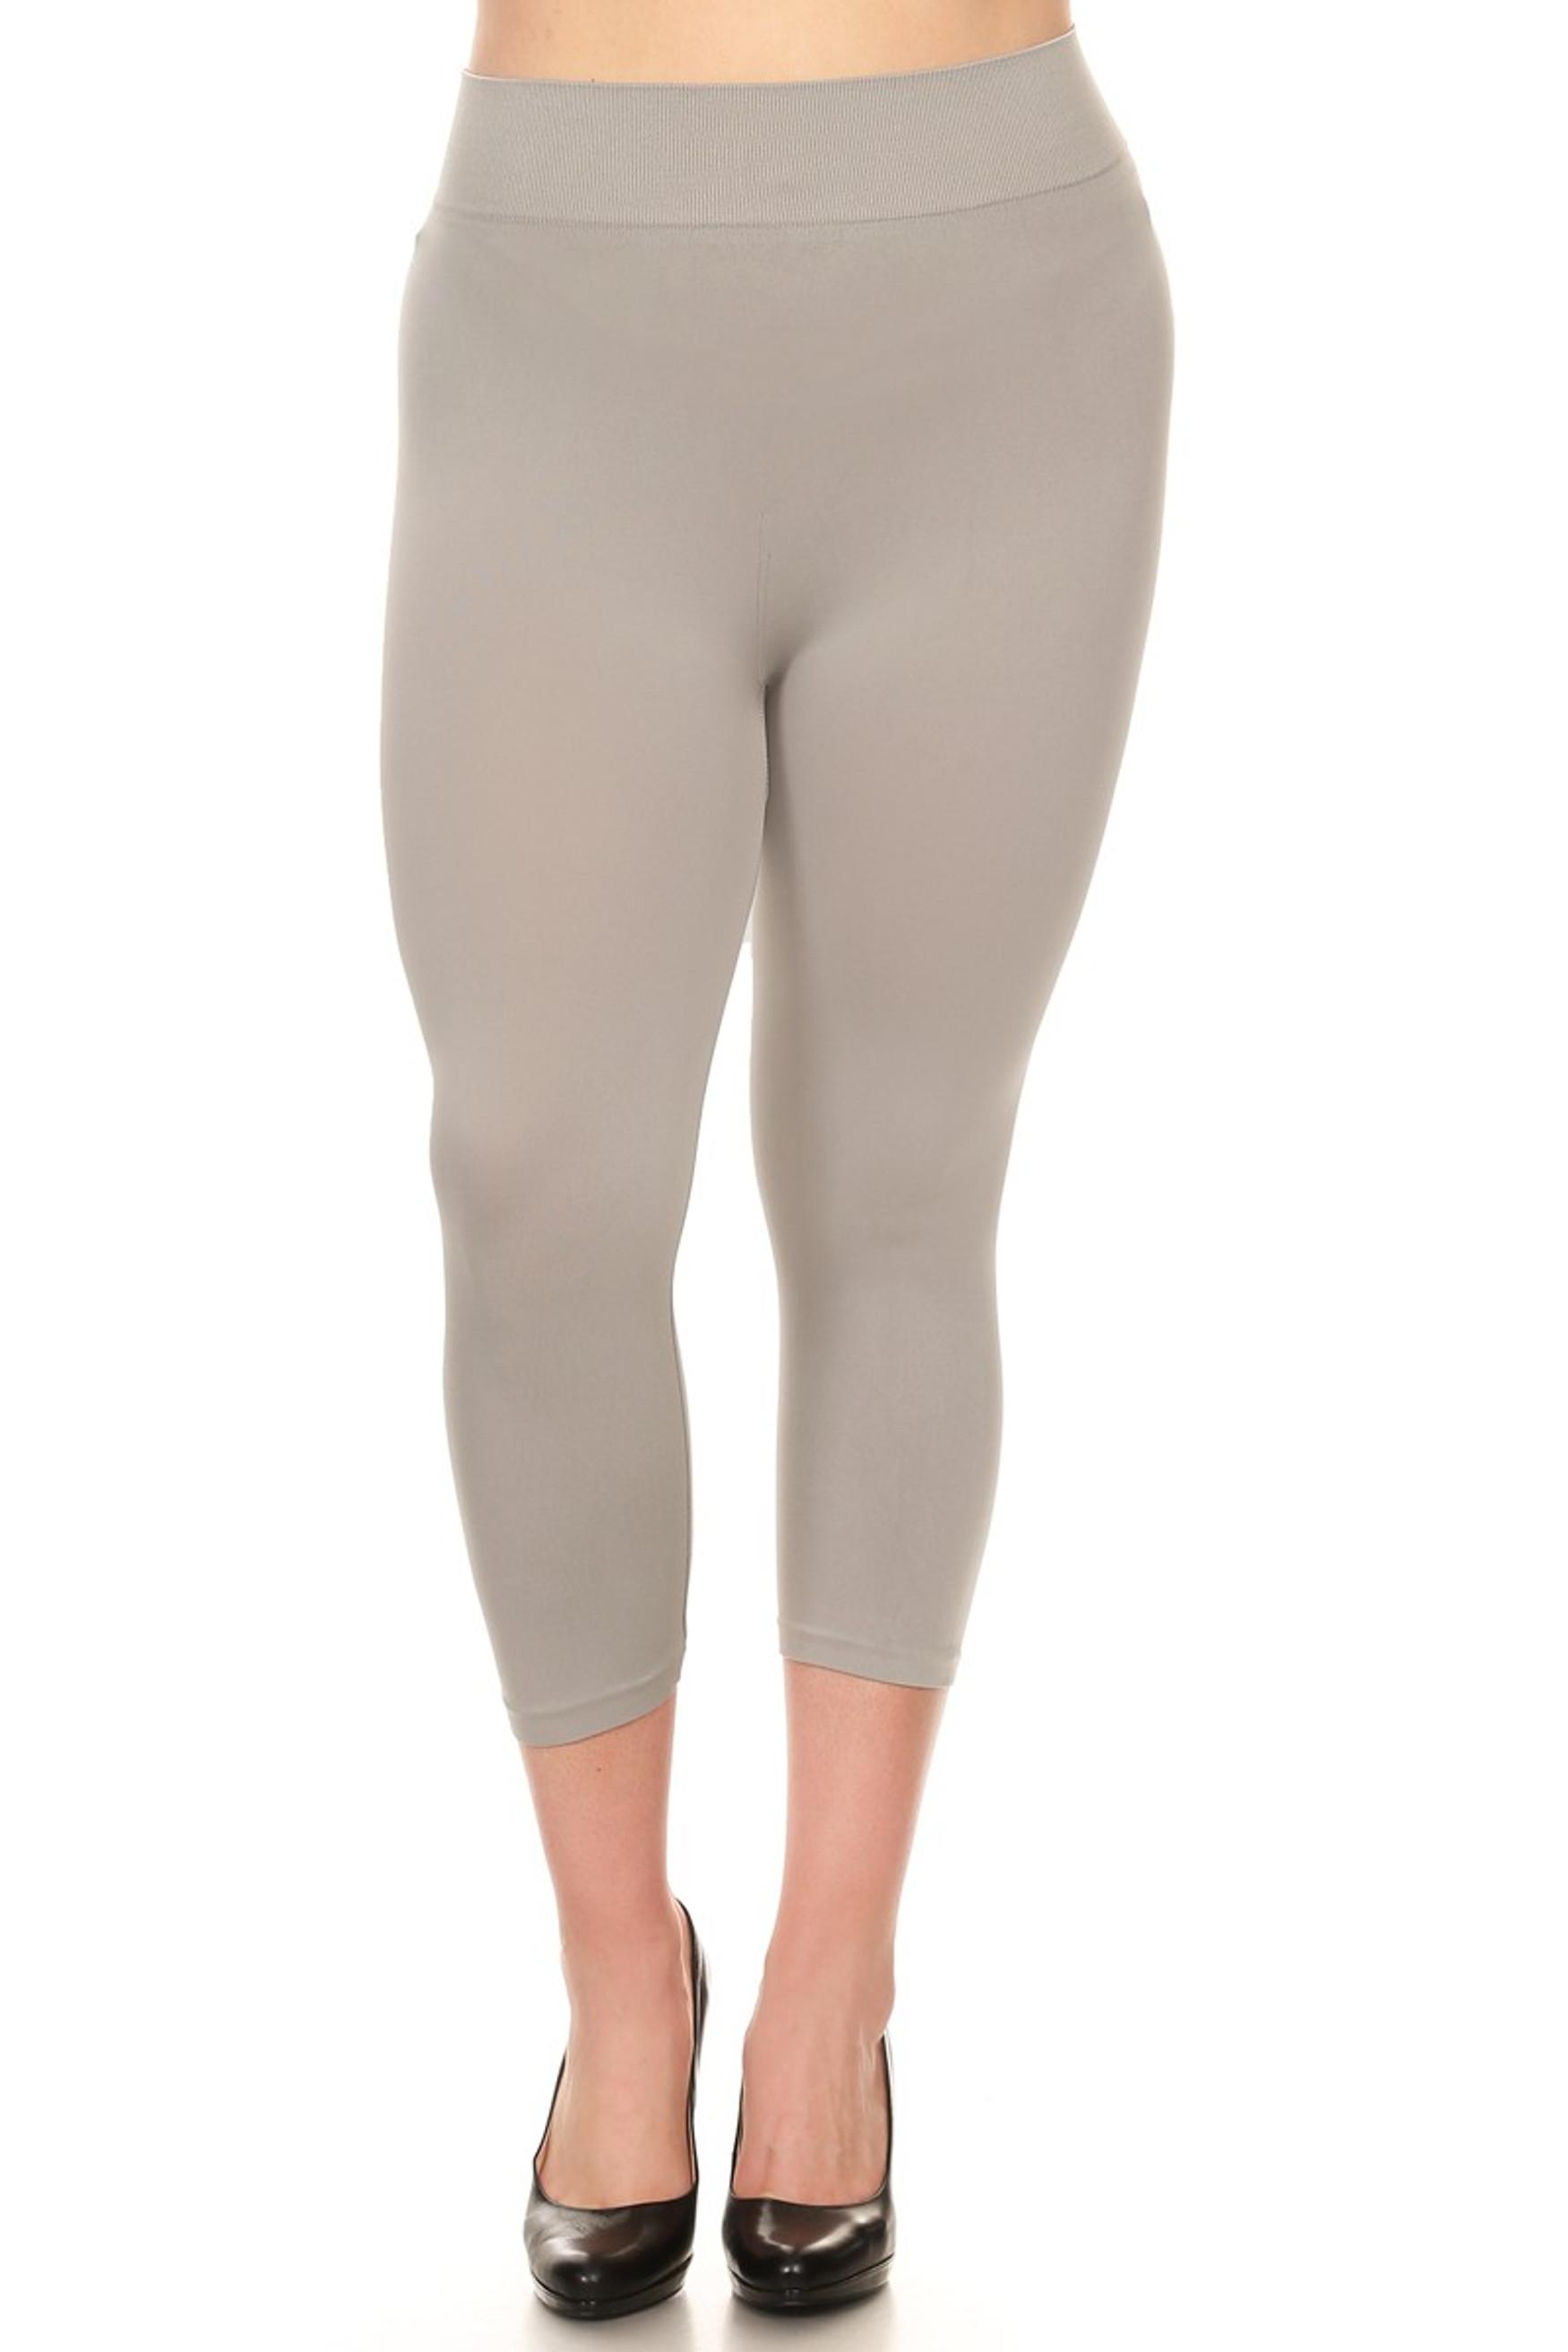 Gray Basic Spandex Capri Plus Size Leggings